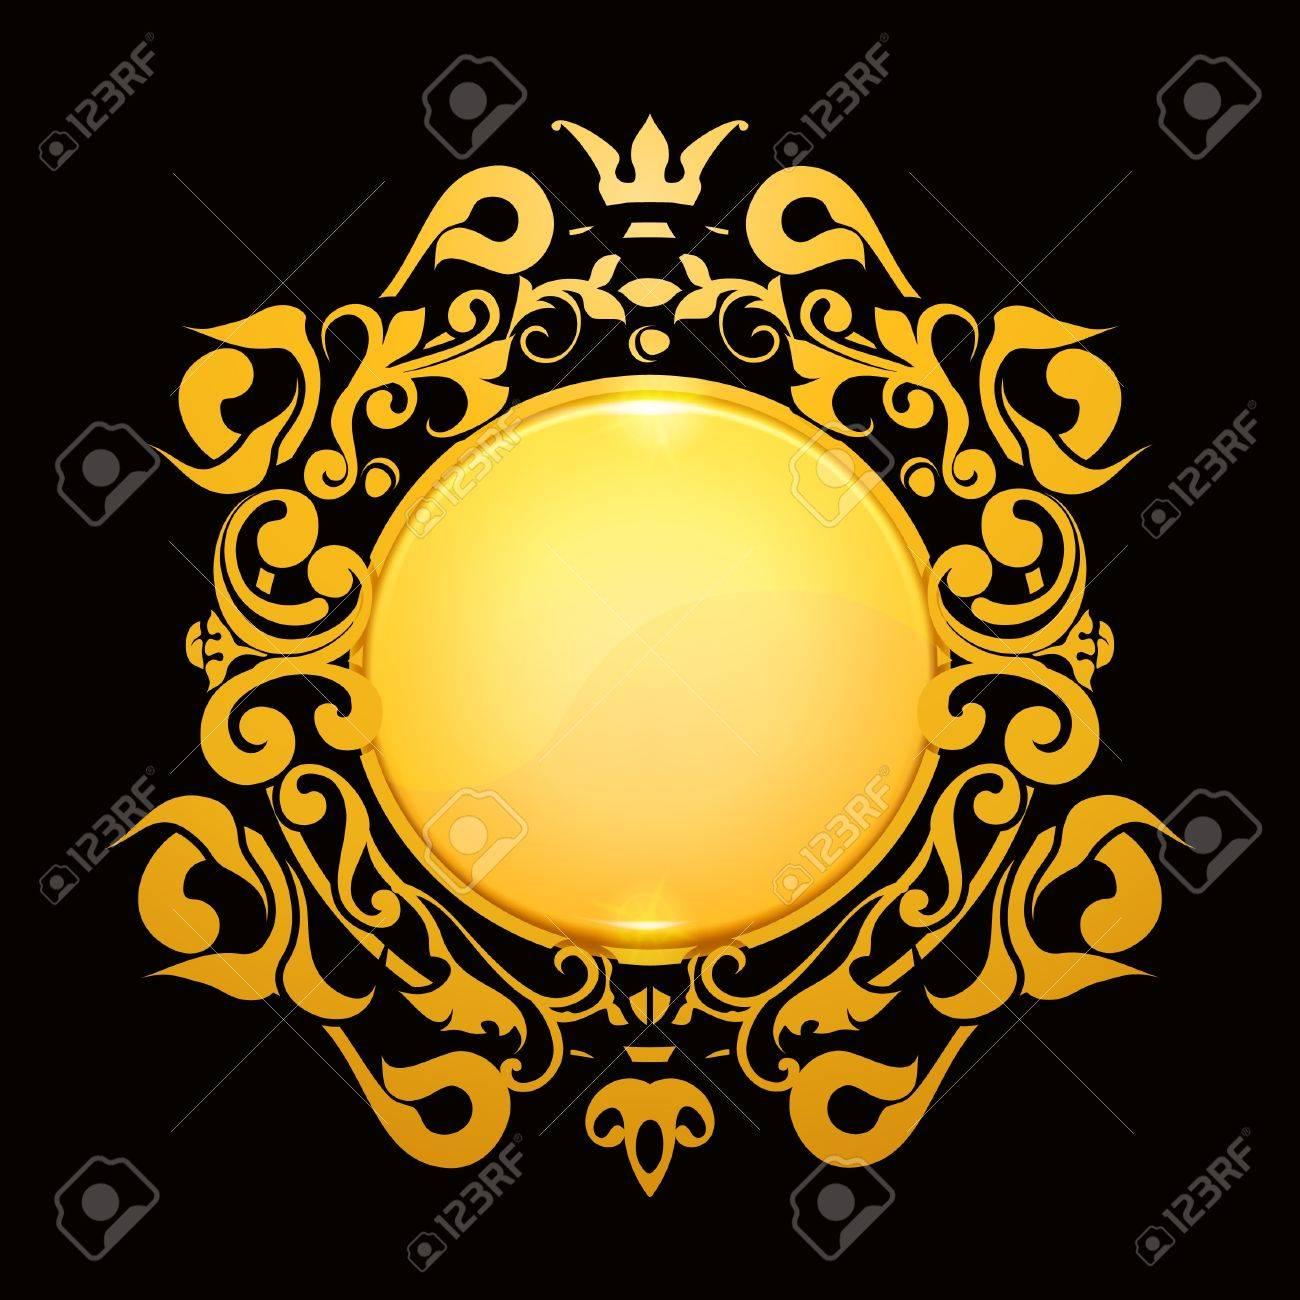 Gold Frame Stock Vector - 13759014